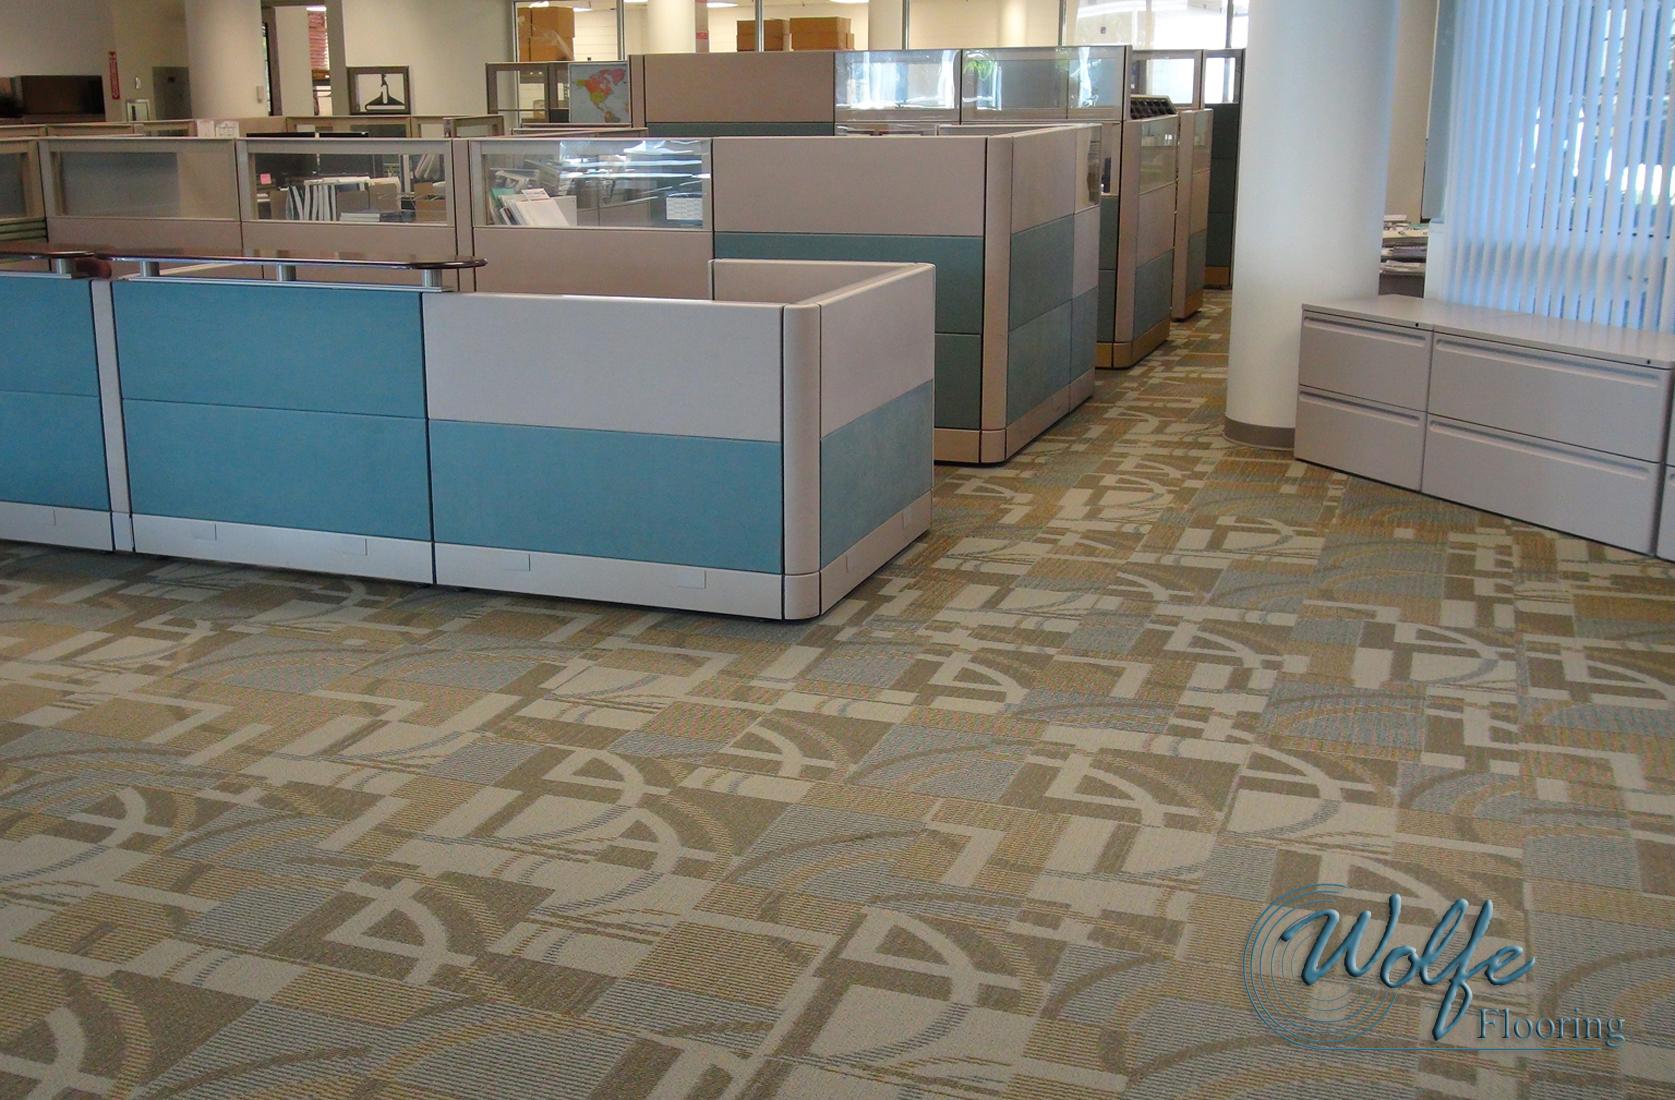 ... 05 commercial carpet tile manningtonu0027s landmark modular carpet color  canton ... ABKDAGG